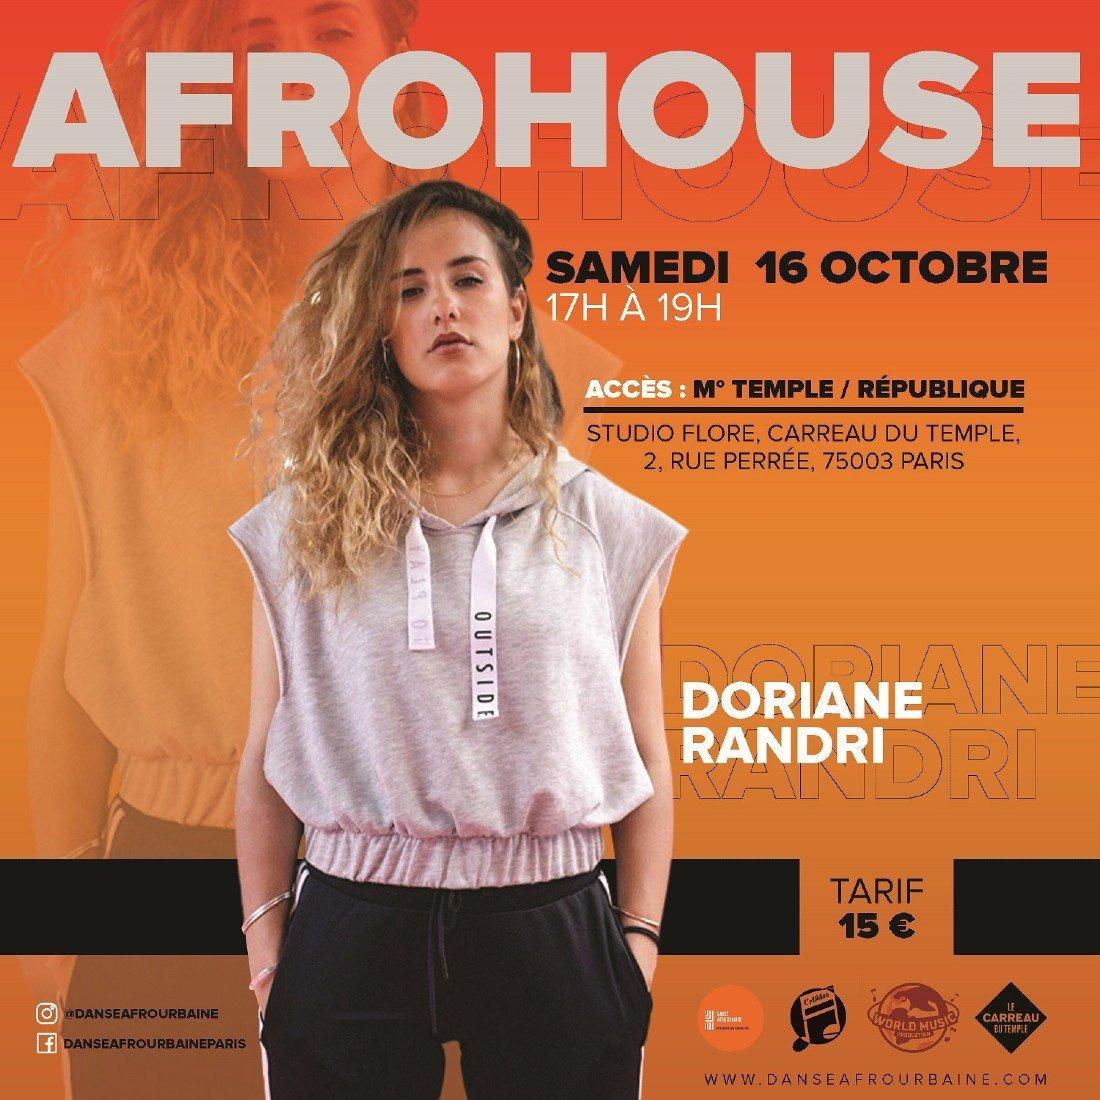 Stage d'Afrohouse avec Doriane Randri